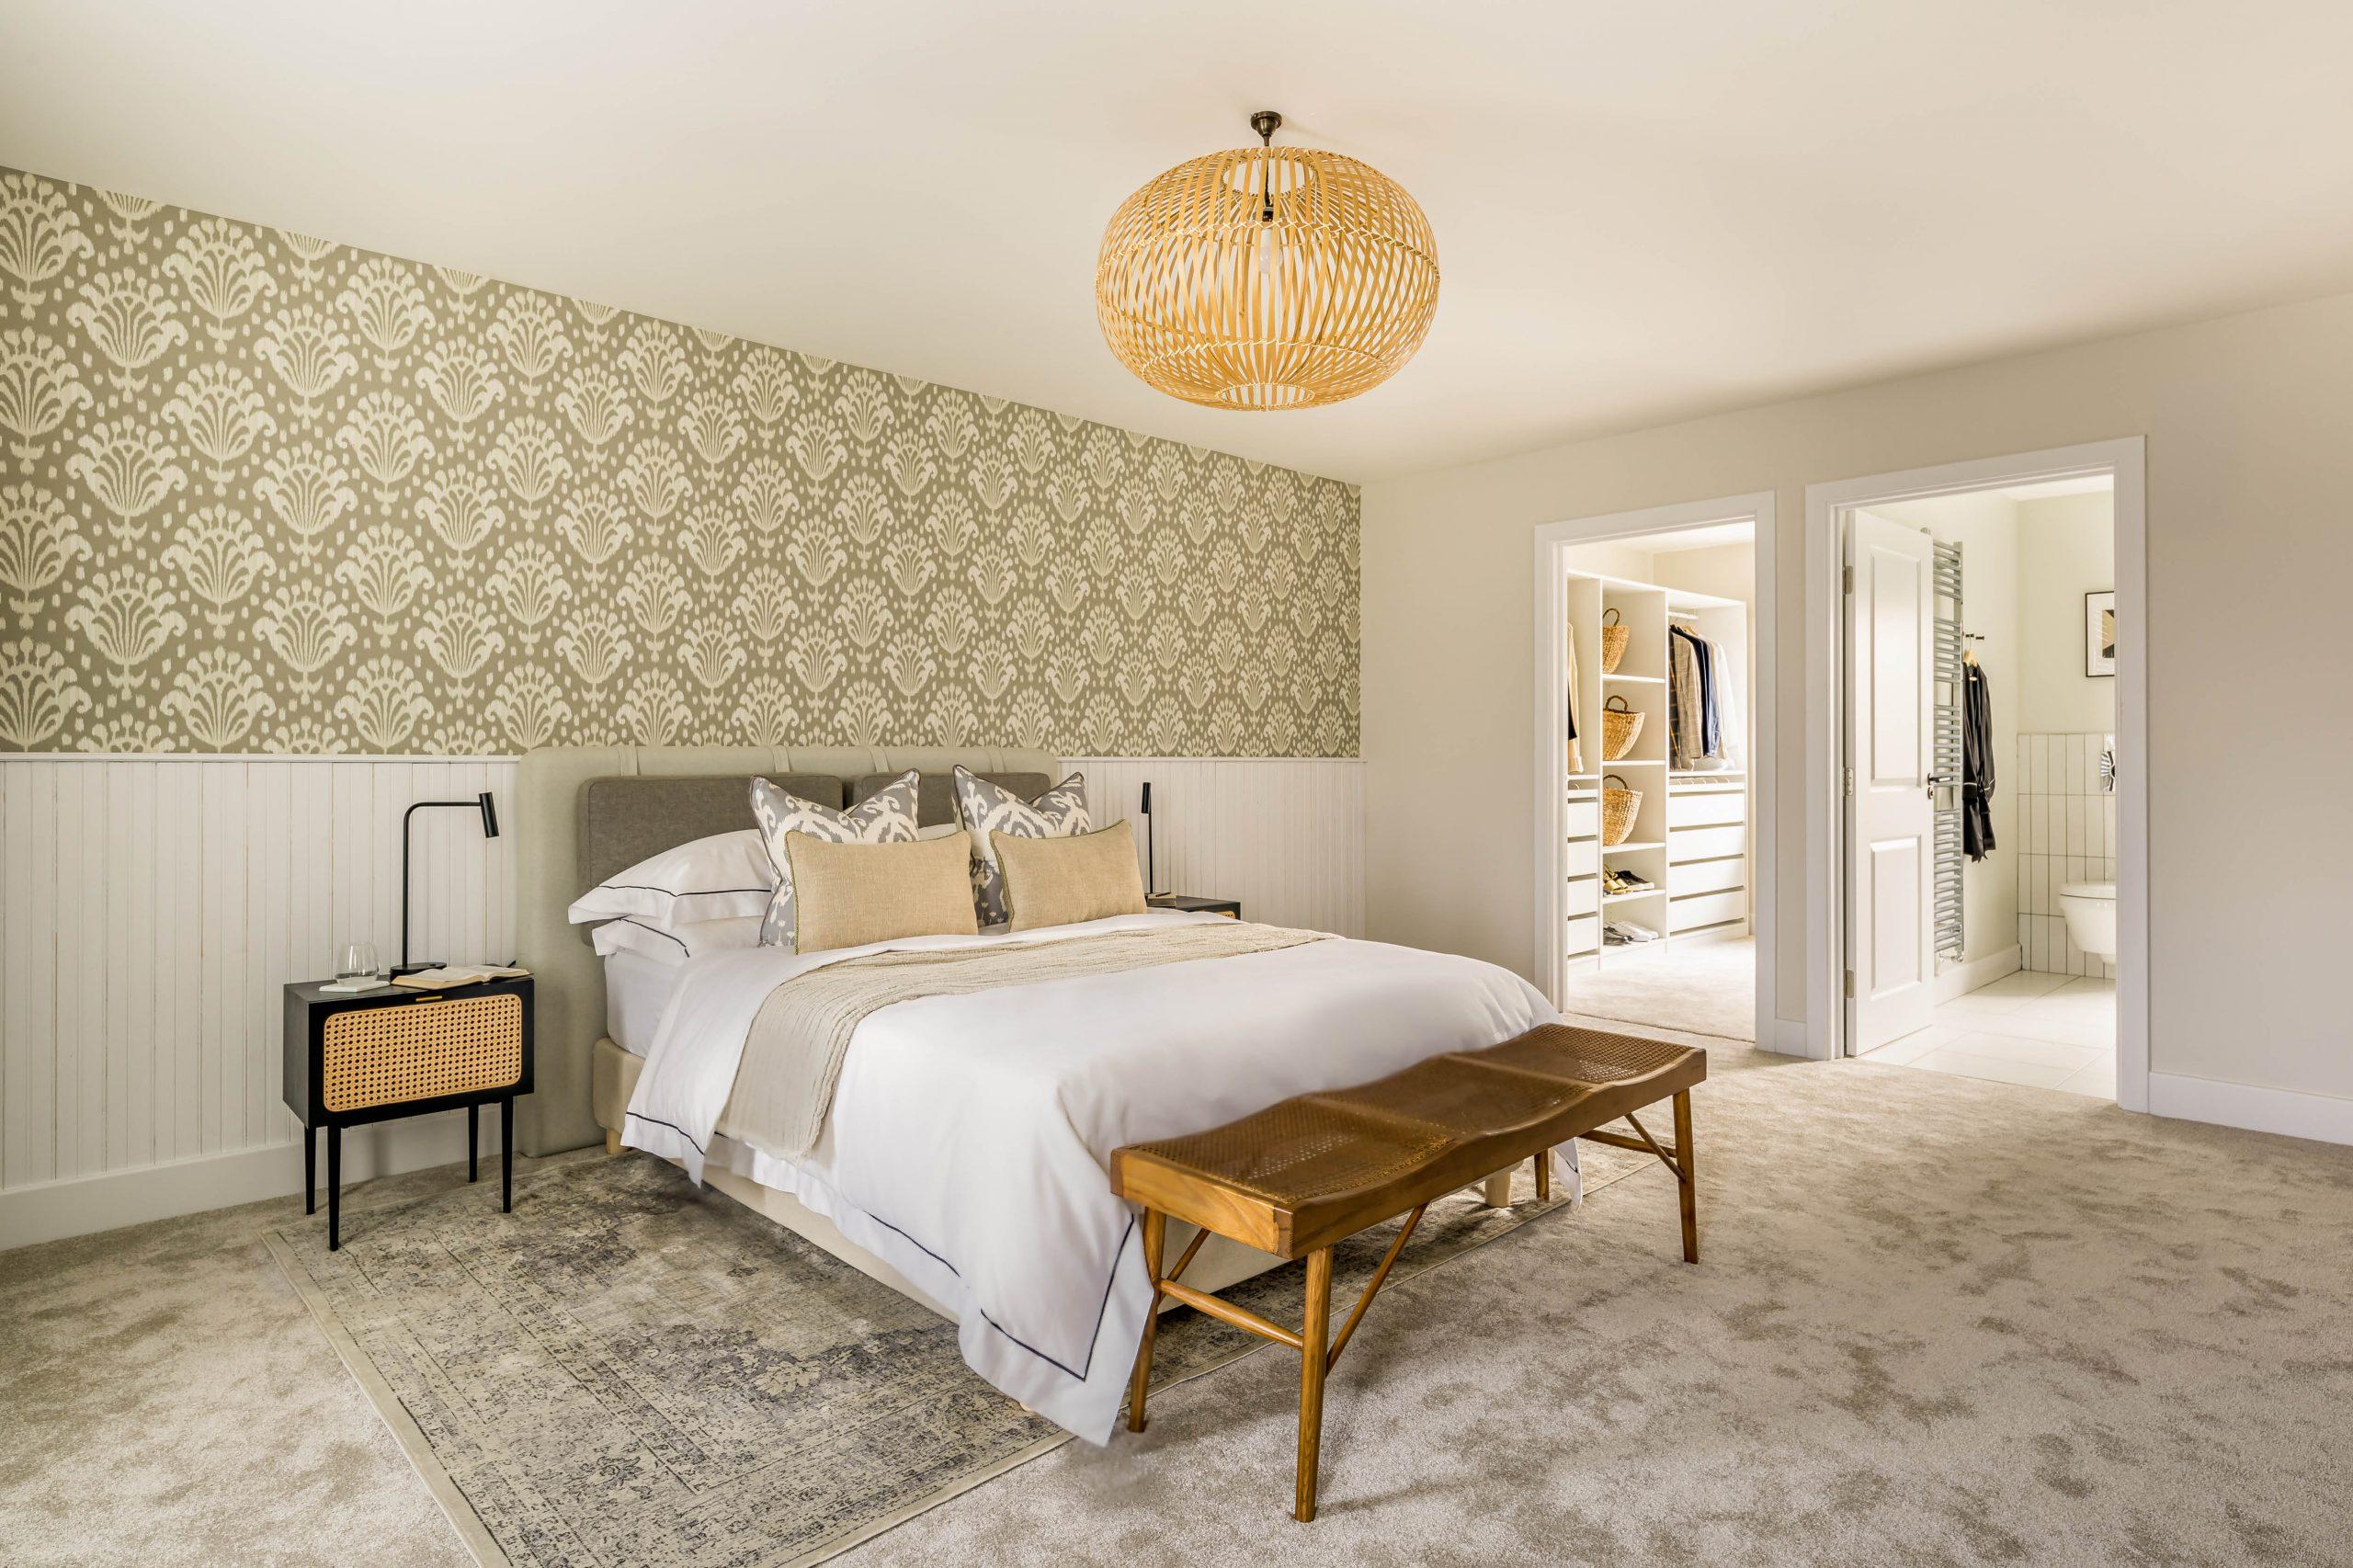 Garden Mews master bedroom suite interior